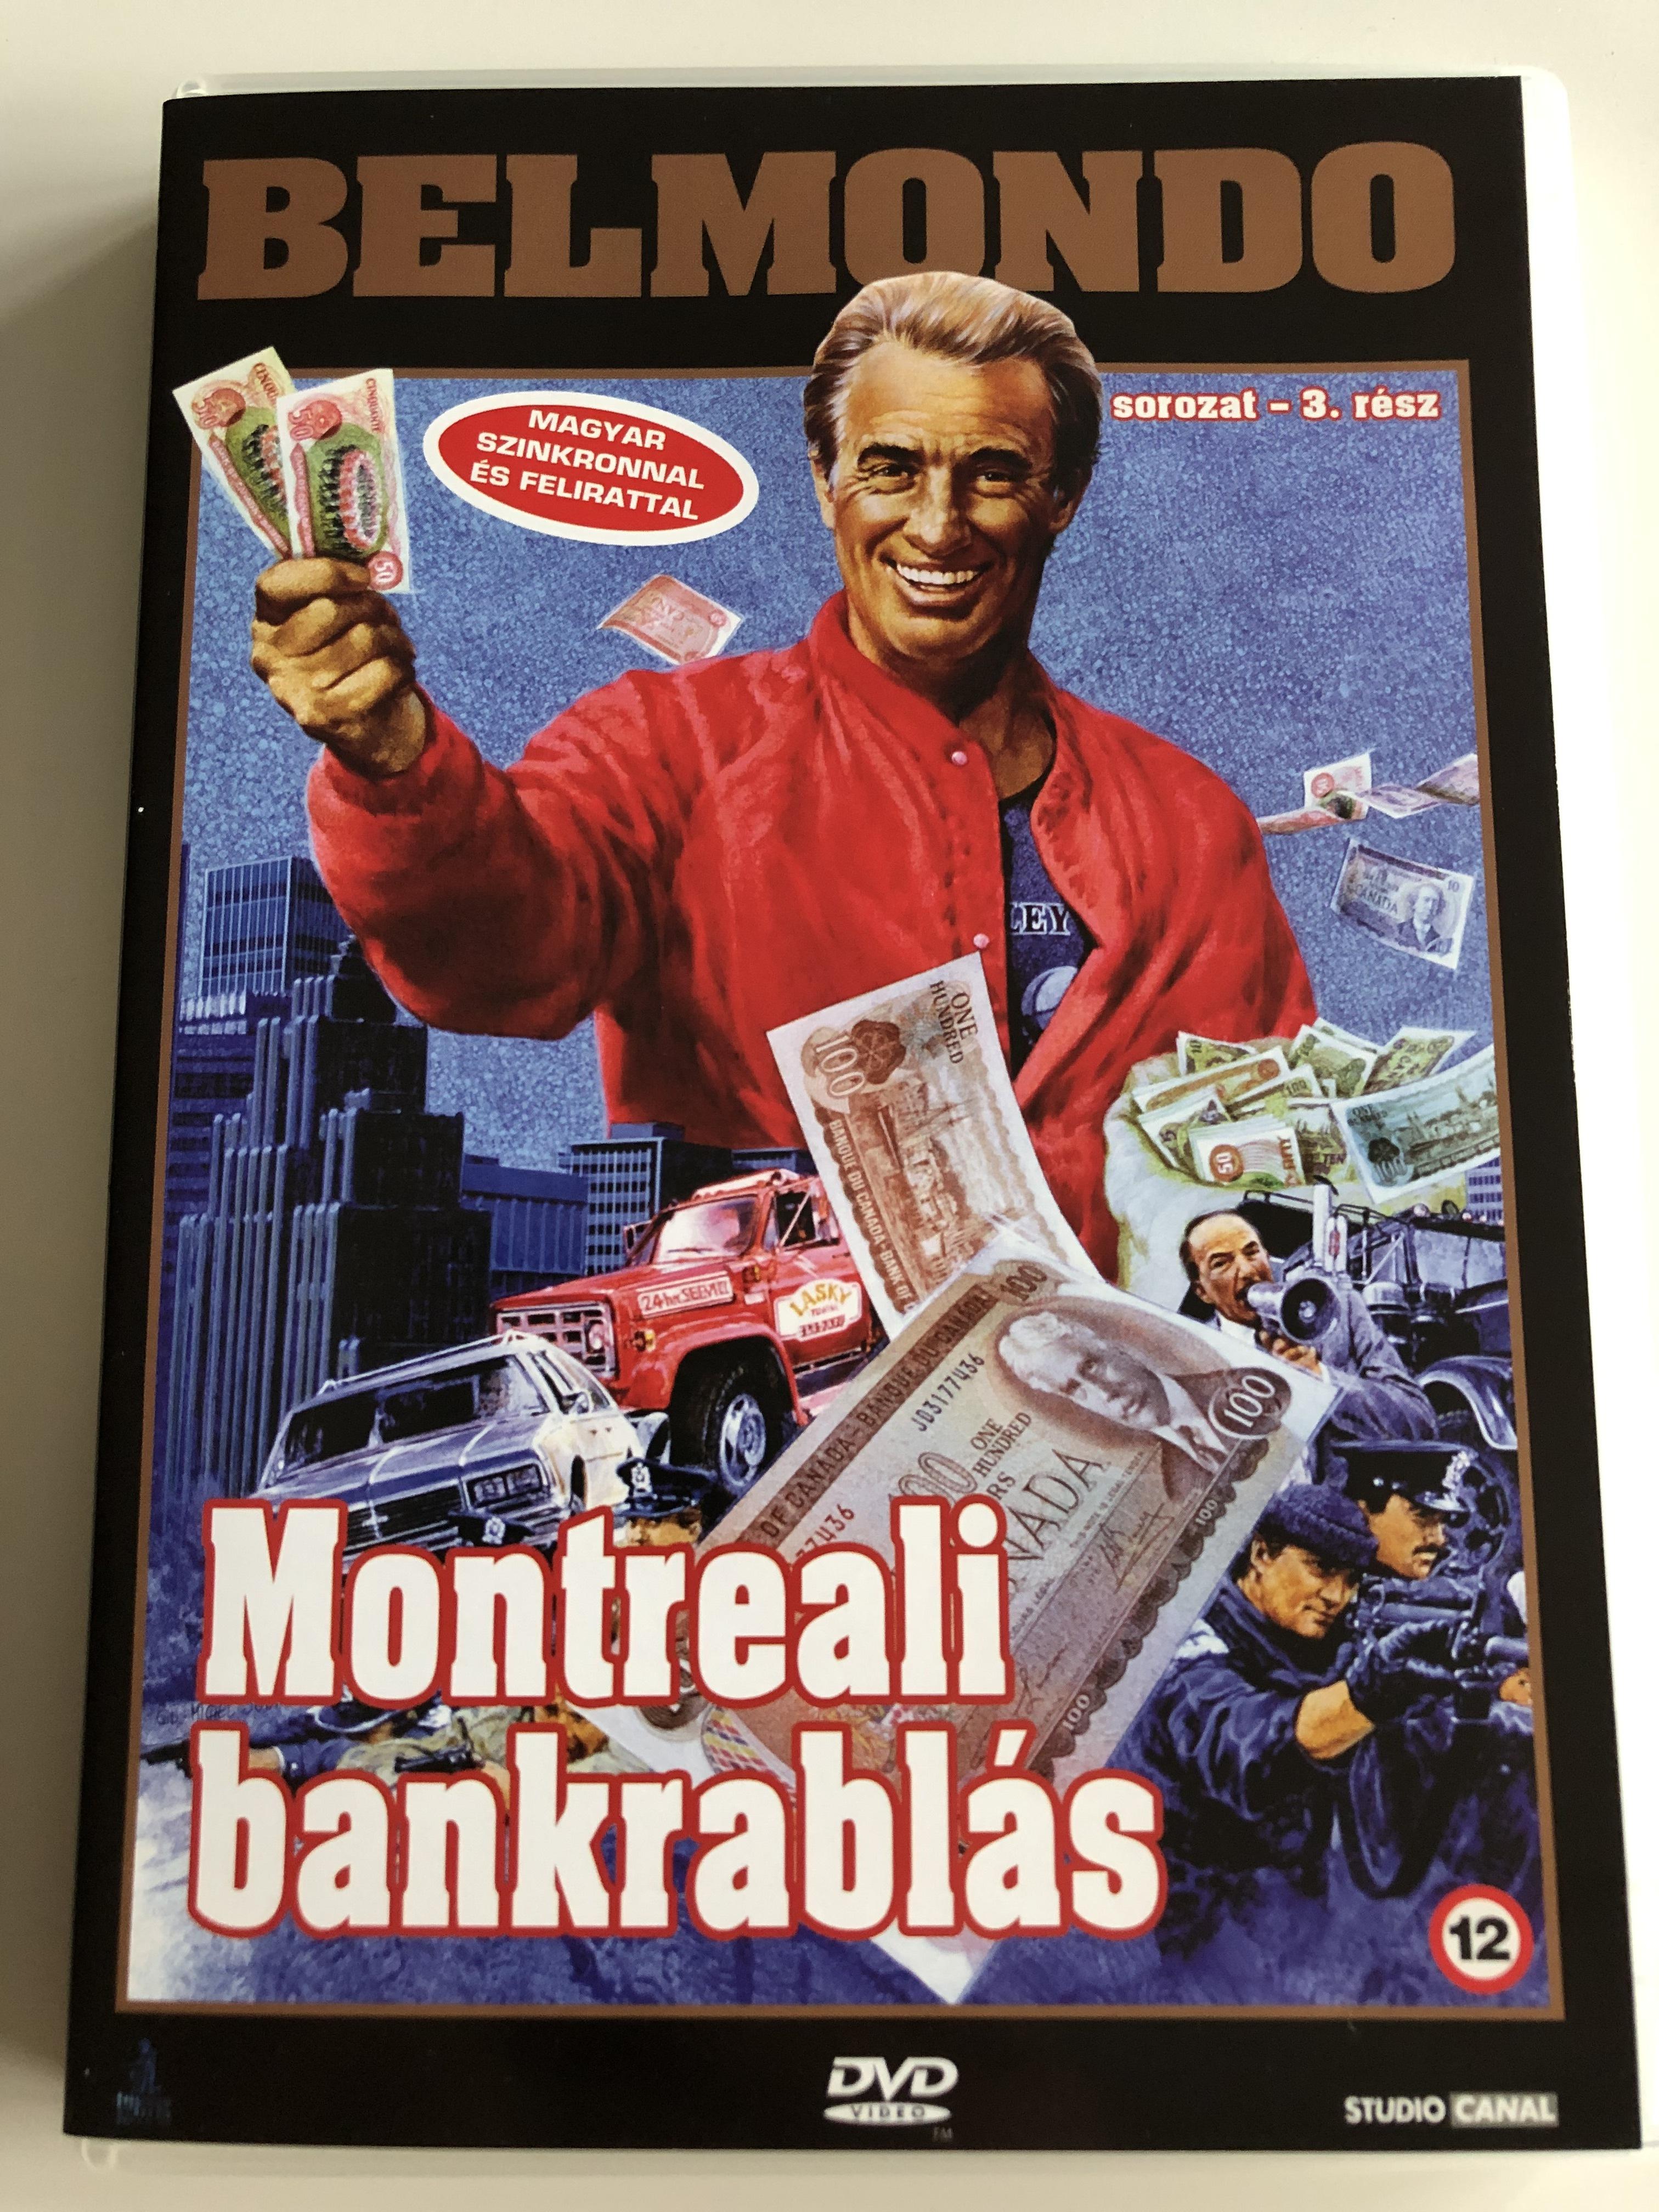 hold-up-dvd-1985-montreali-bankrabl-s-directed-by-alexandre-arcady-belmondo-series-pt.-3-starring-jean-paul-belmondo-kim-cattrall-guy-marchand-jean-pierre-marielle-1-.jpg